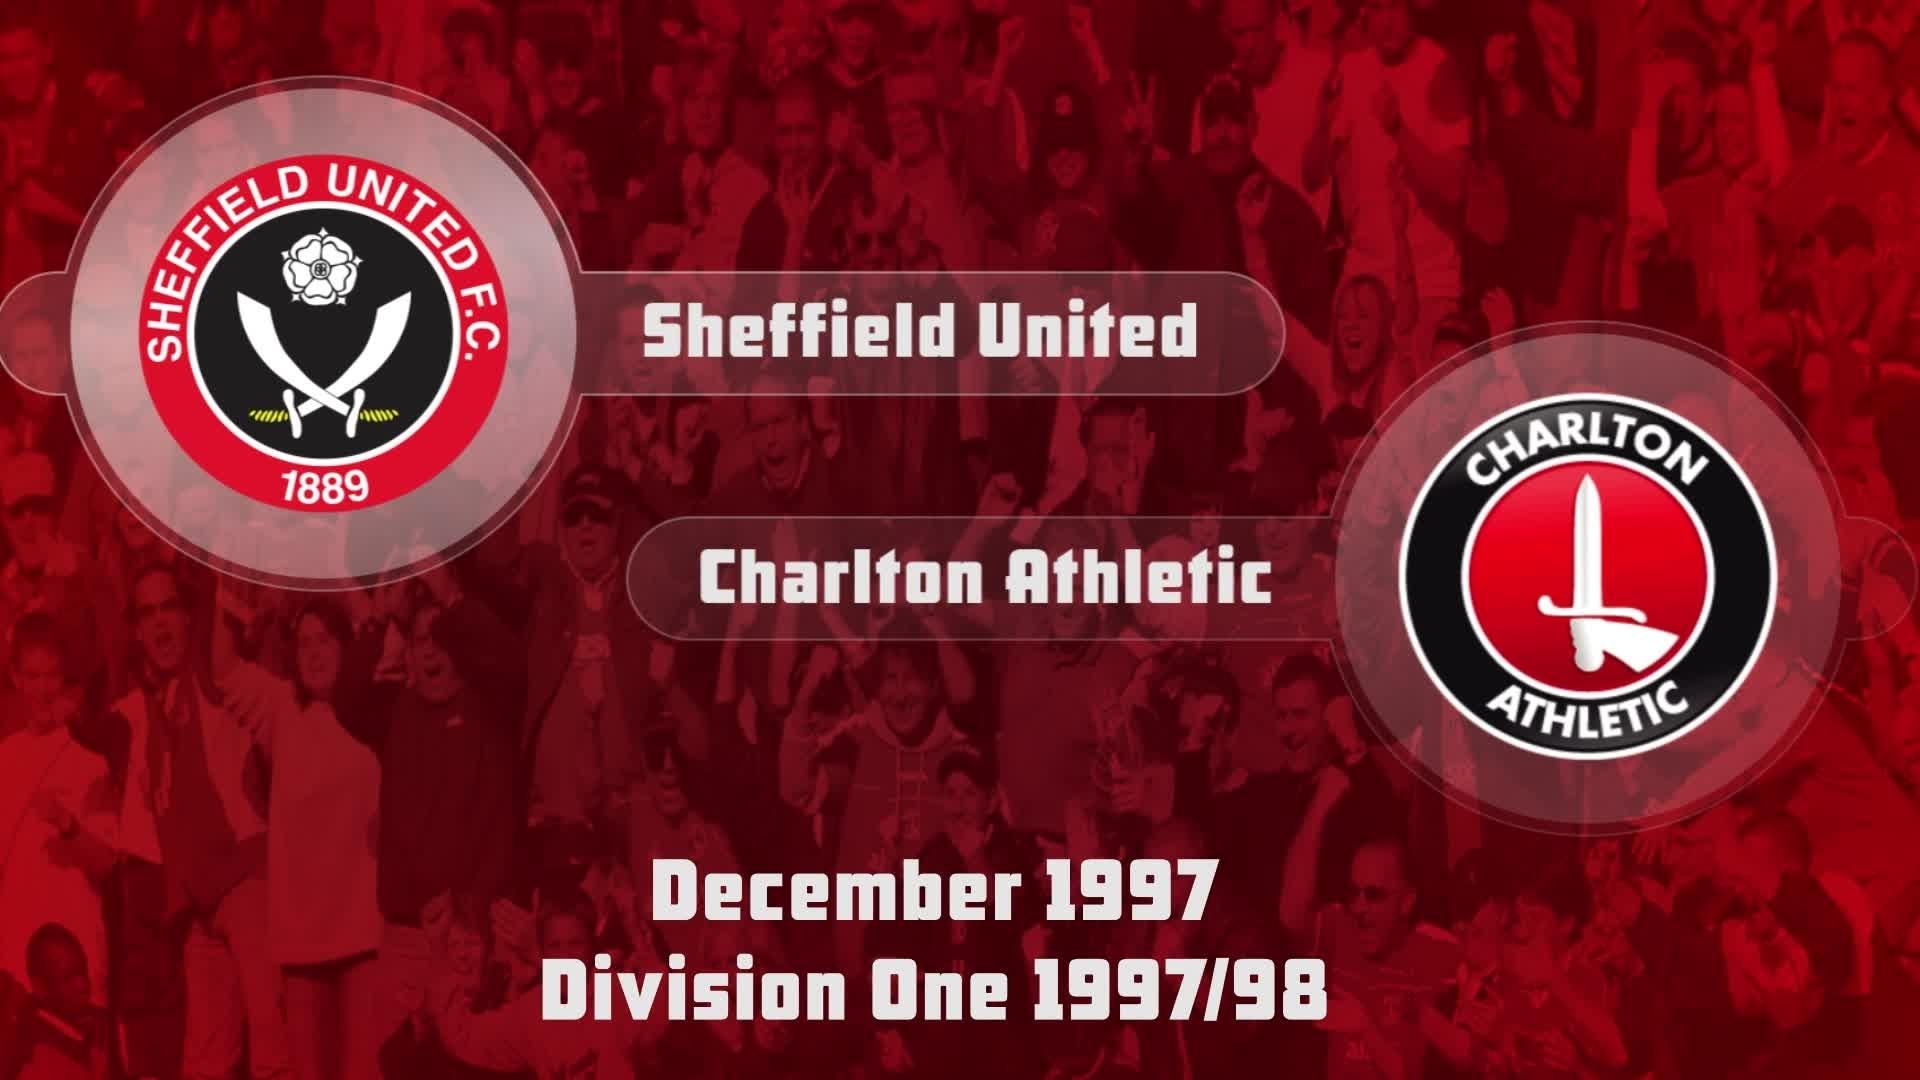 27 HIGHLIGHTS | Shef Utd 4 Charlton 1 (Dec 1997)